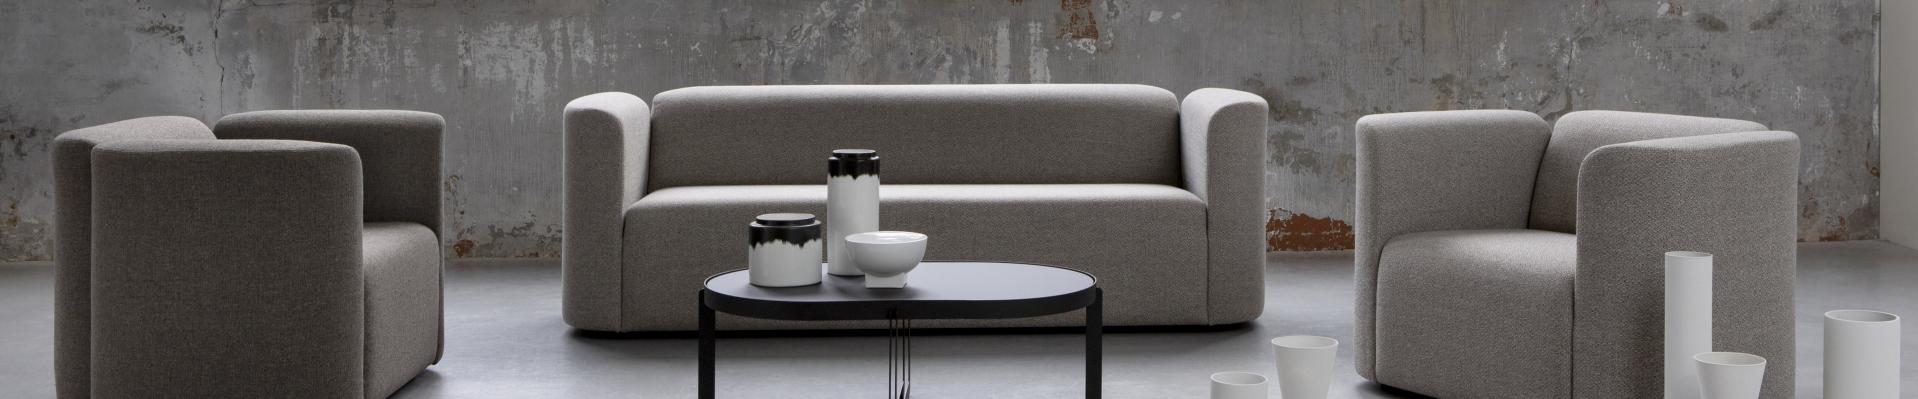 Banne Slice Sofa